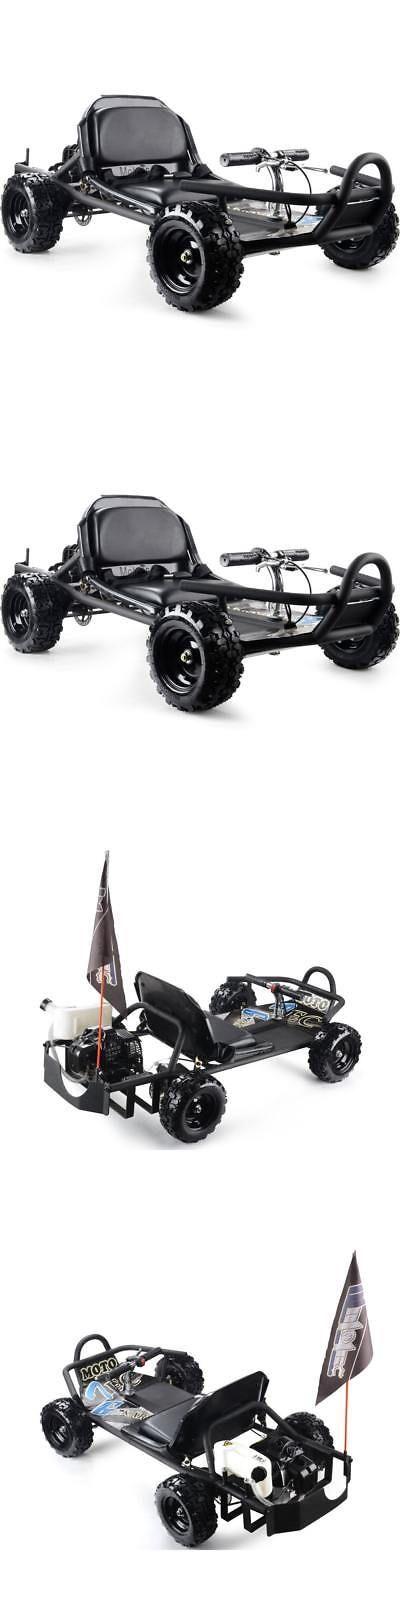 Complete Go-Karts and Frames 64656: Mototec Sandman Black 49Cc Go Kart -> BUY IT NOW ONLY: $563.49 on eBay!